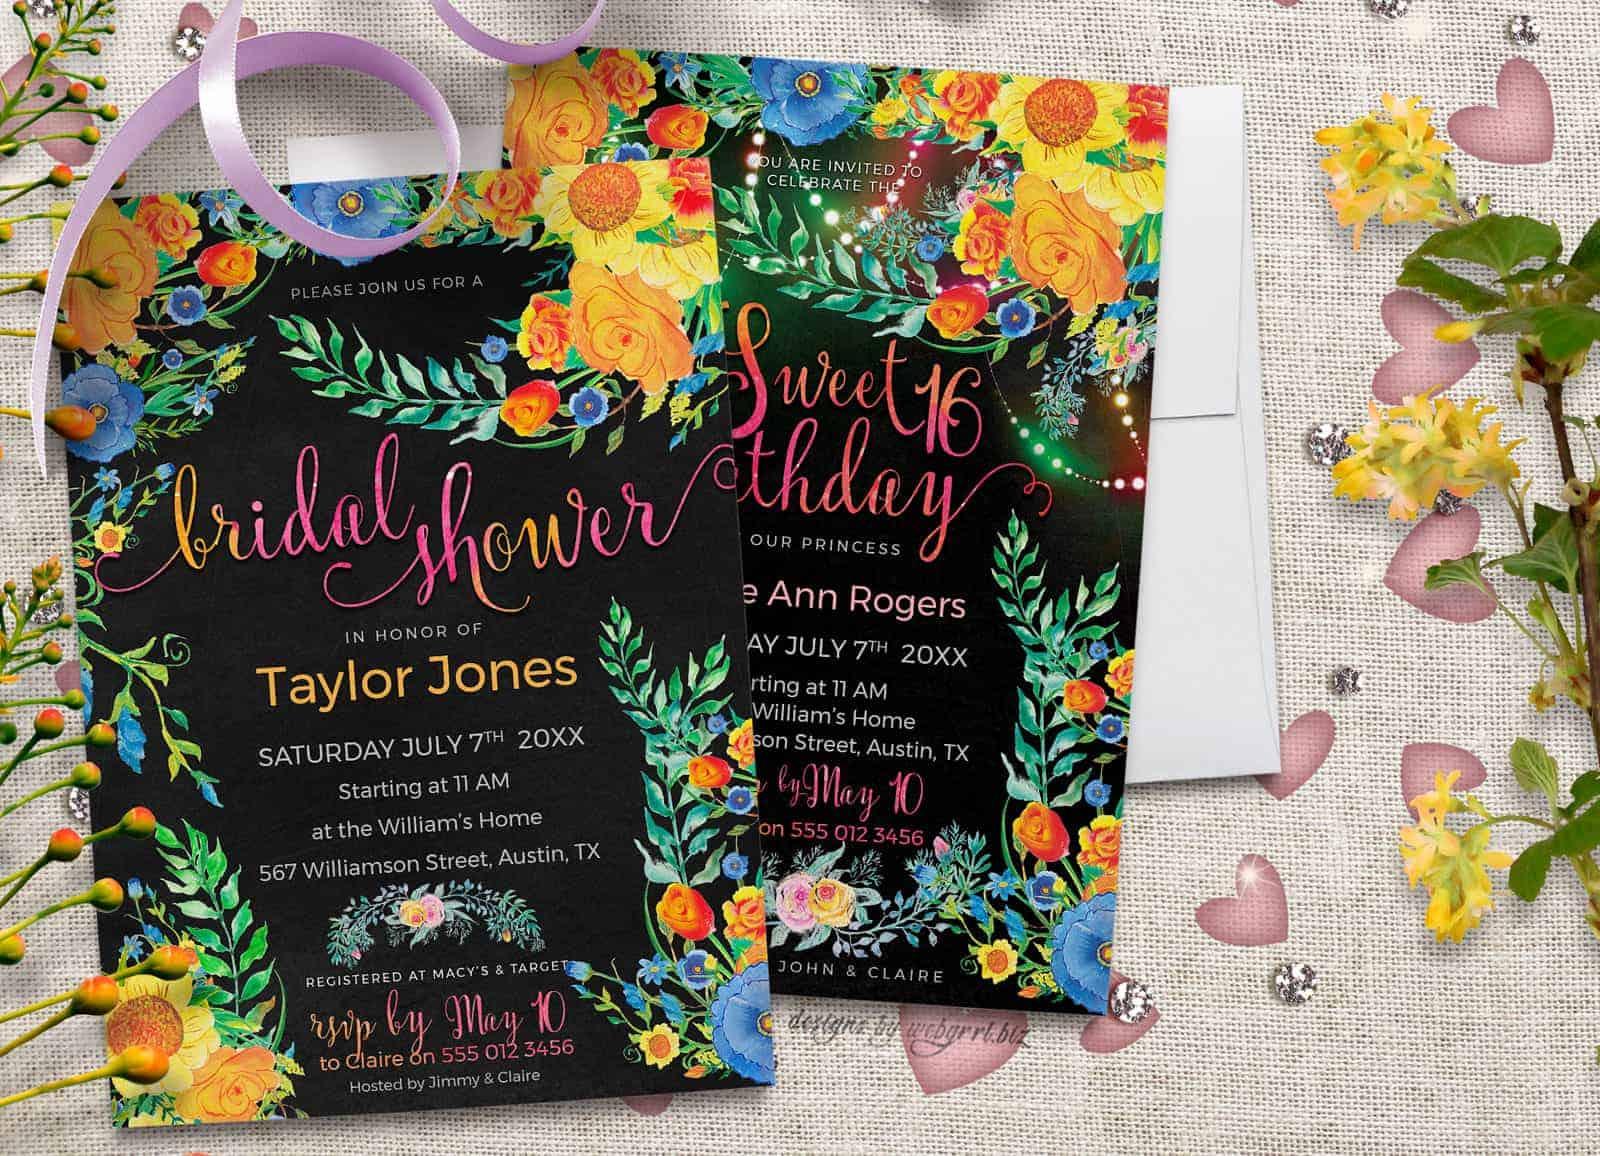 My Best Floral Invitation Card Designs Unique Designs by Webgrrl